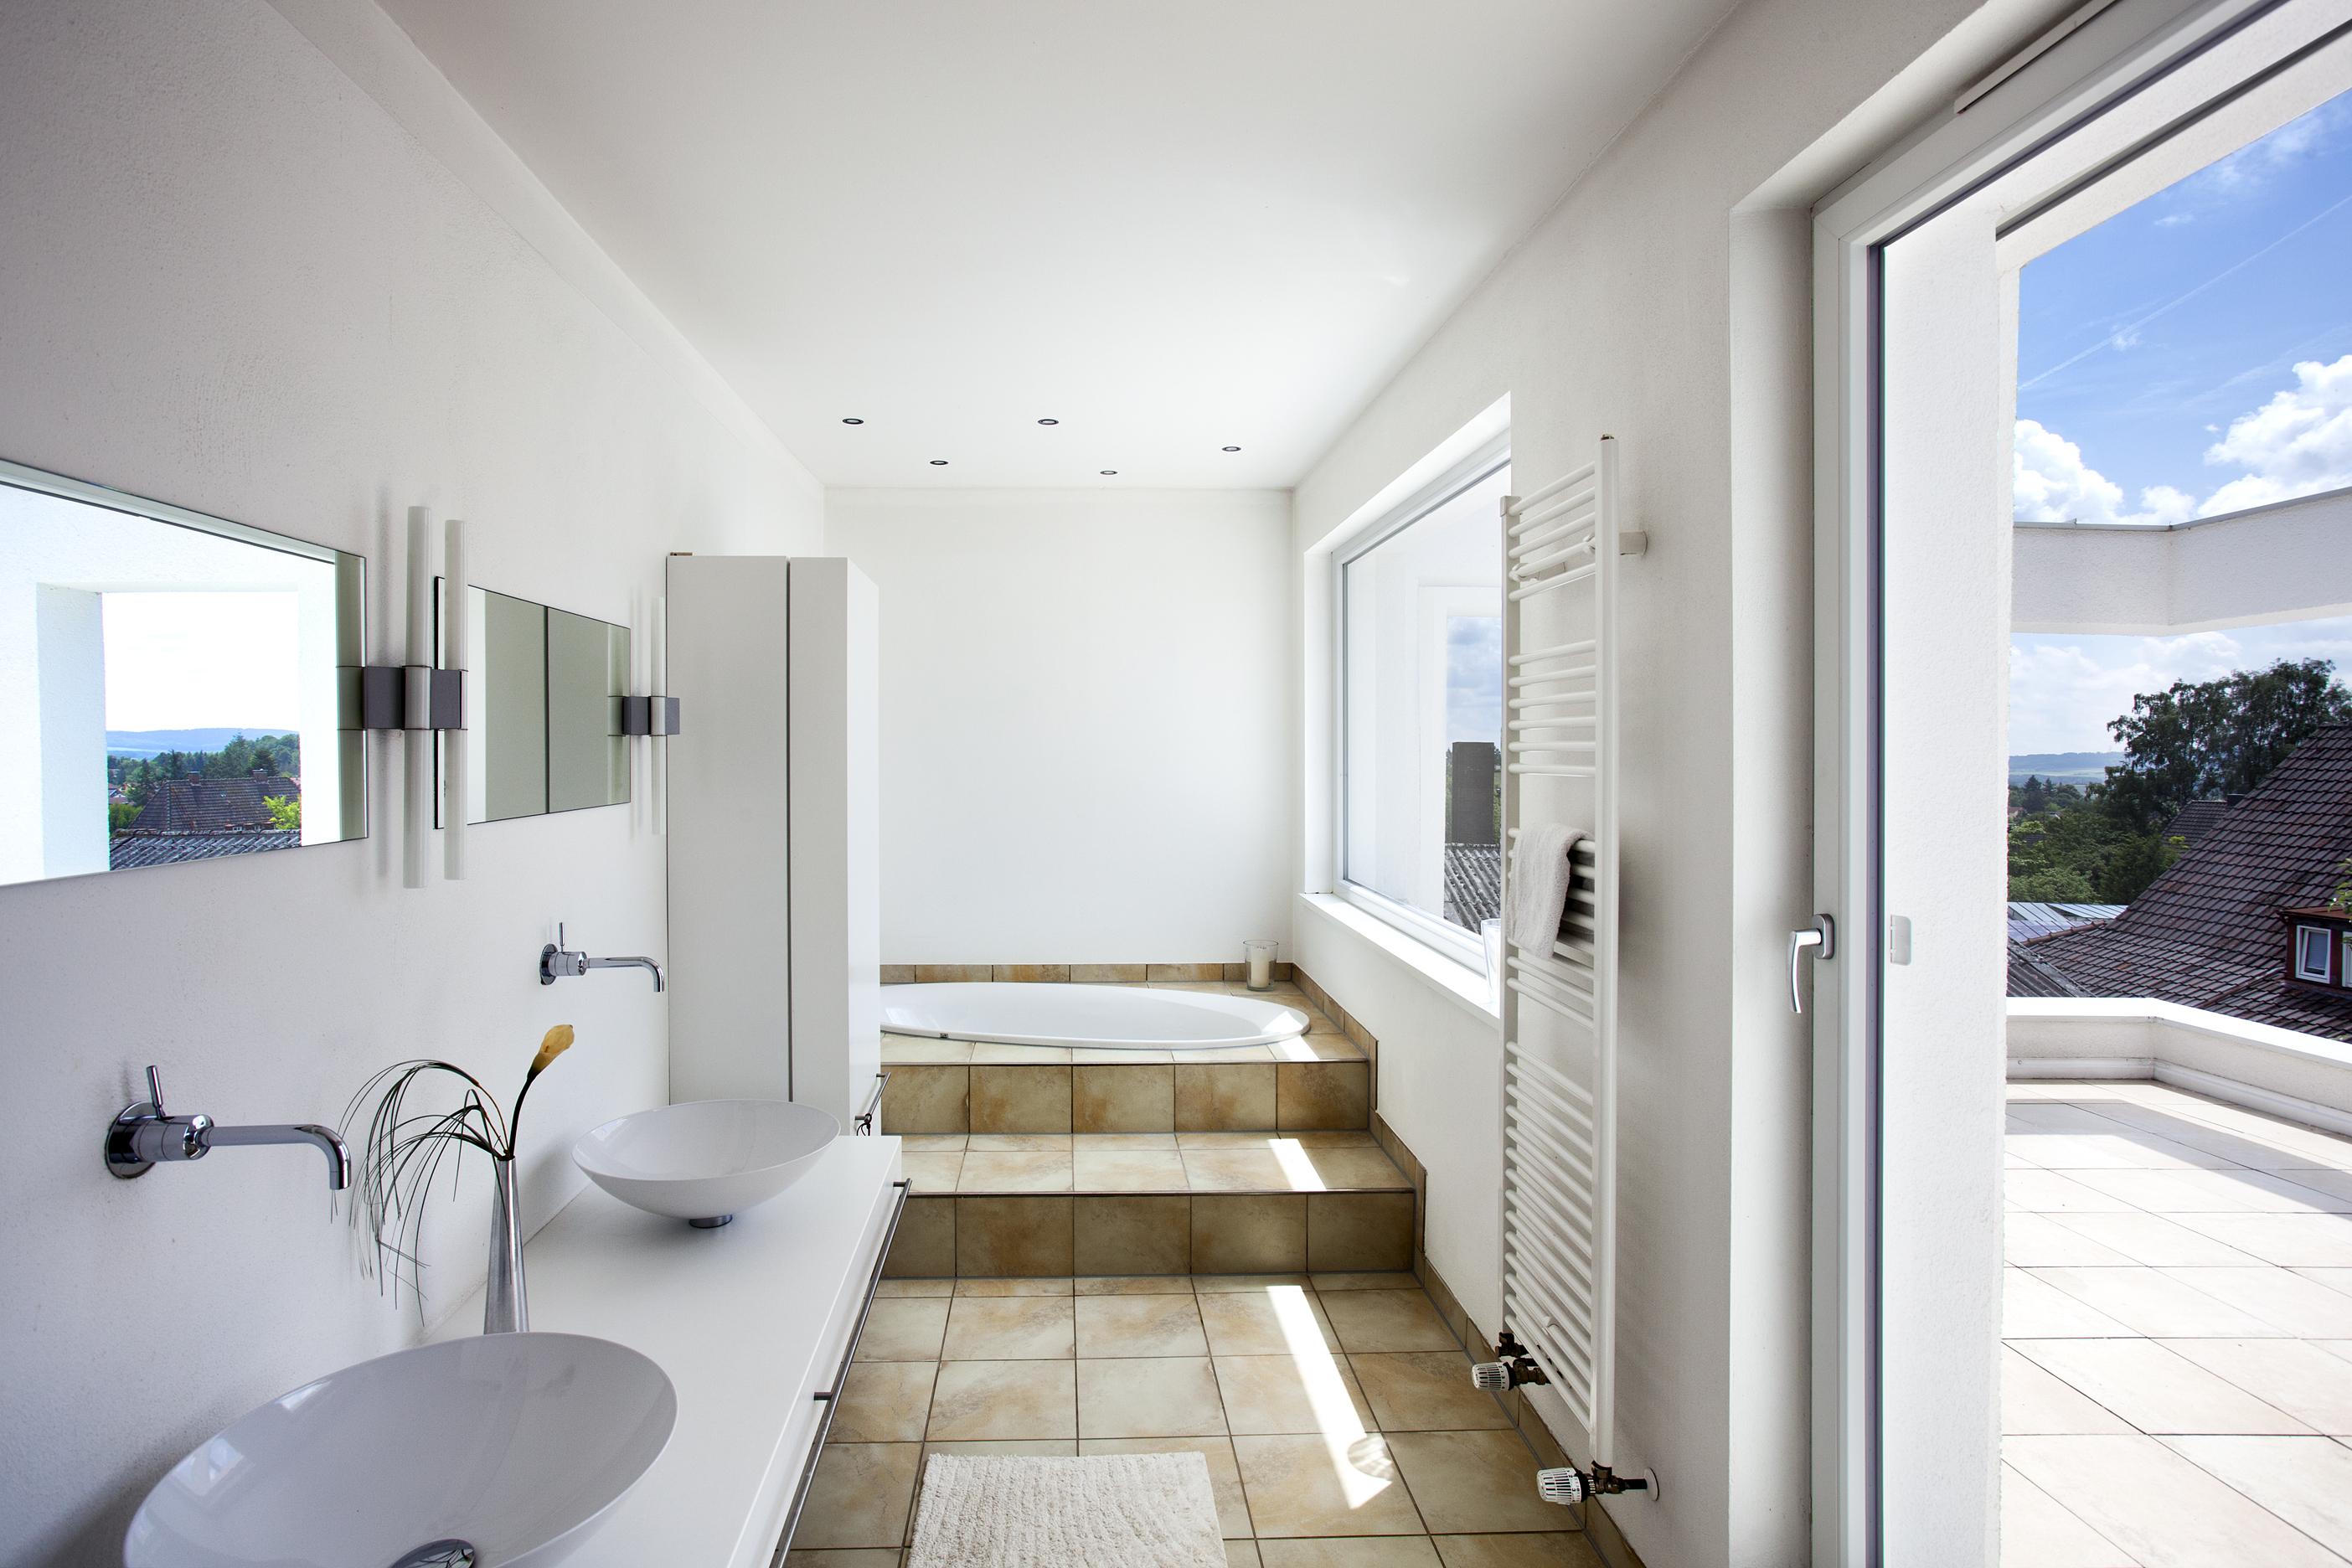 alu kunststoff fenster glas rapp duschkabinen glast ren glasvord cher fenster haust ren uvm. Black Bedroom Furniture Sets. Home Design Ideas